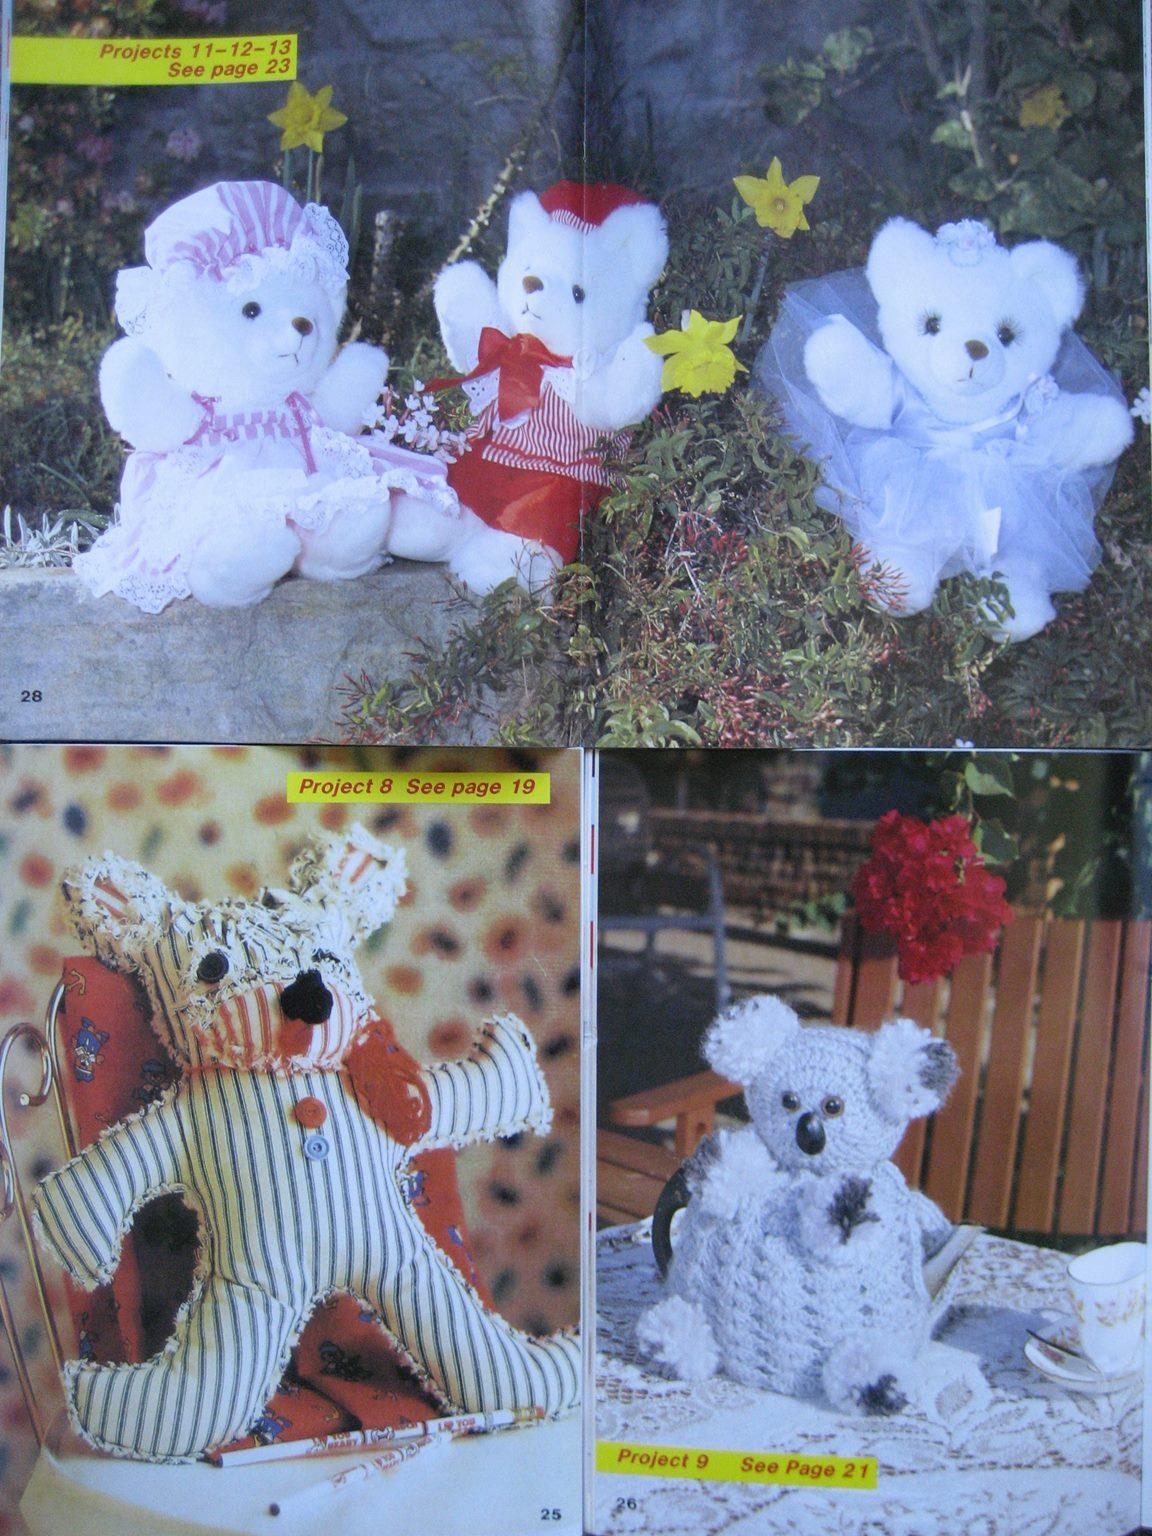 Crochet dress pattern | Crochet dress for amigurumi doll or animal ... | 1536x1152